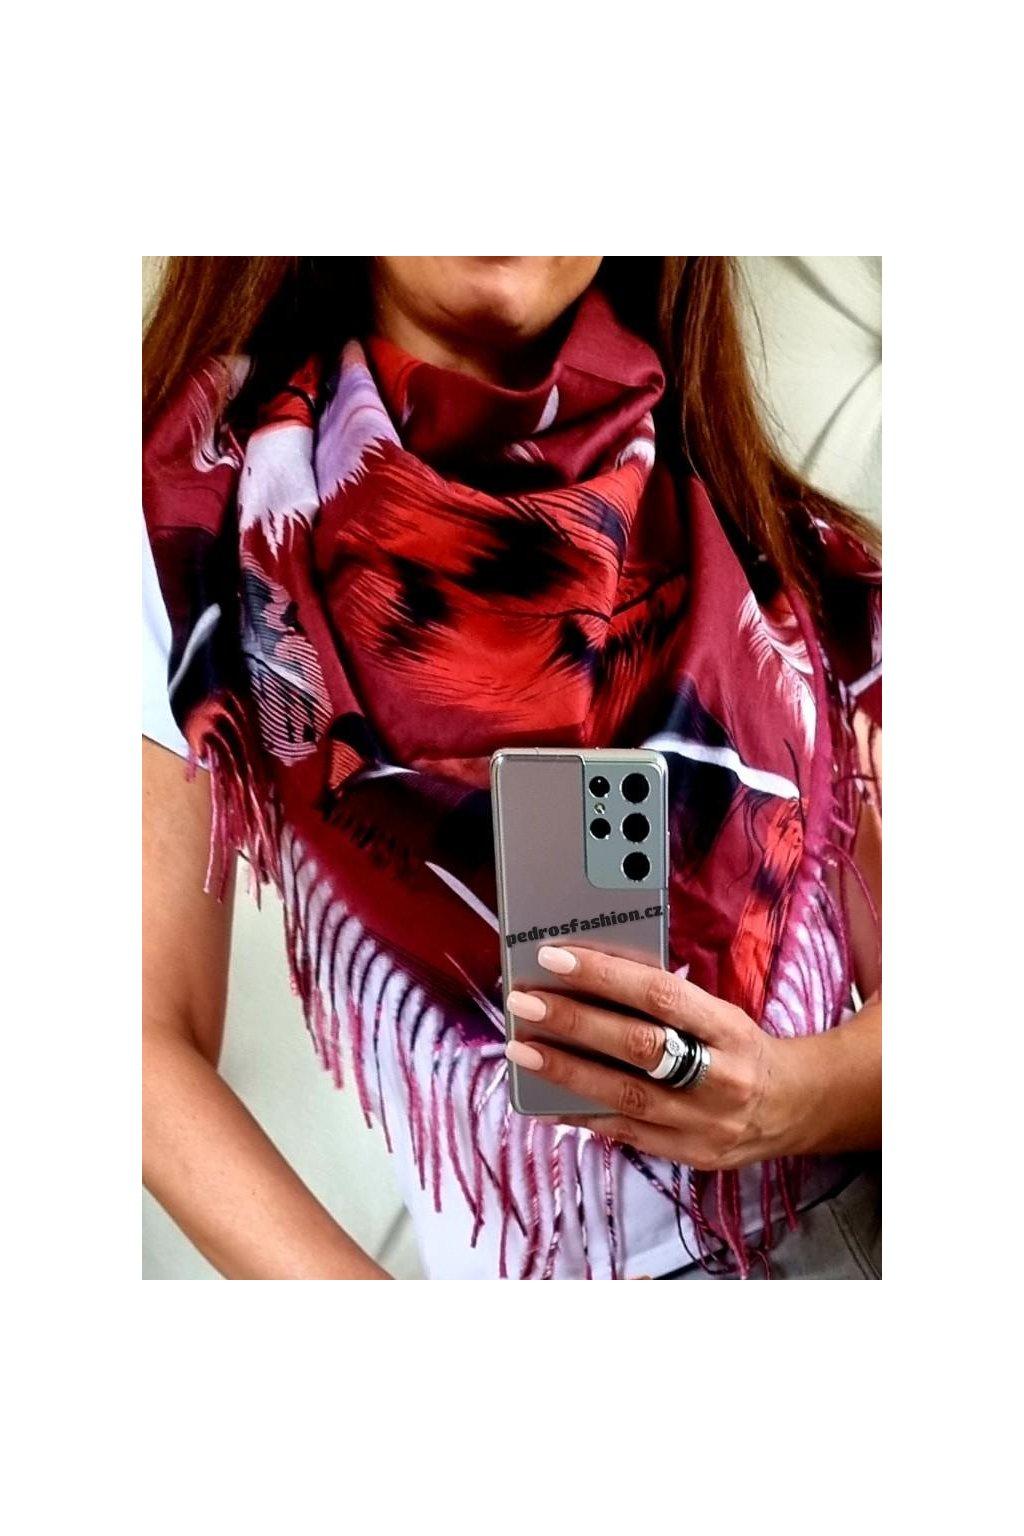 šátek trendy kašmír potisk peří bordó